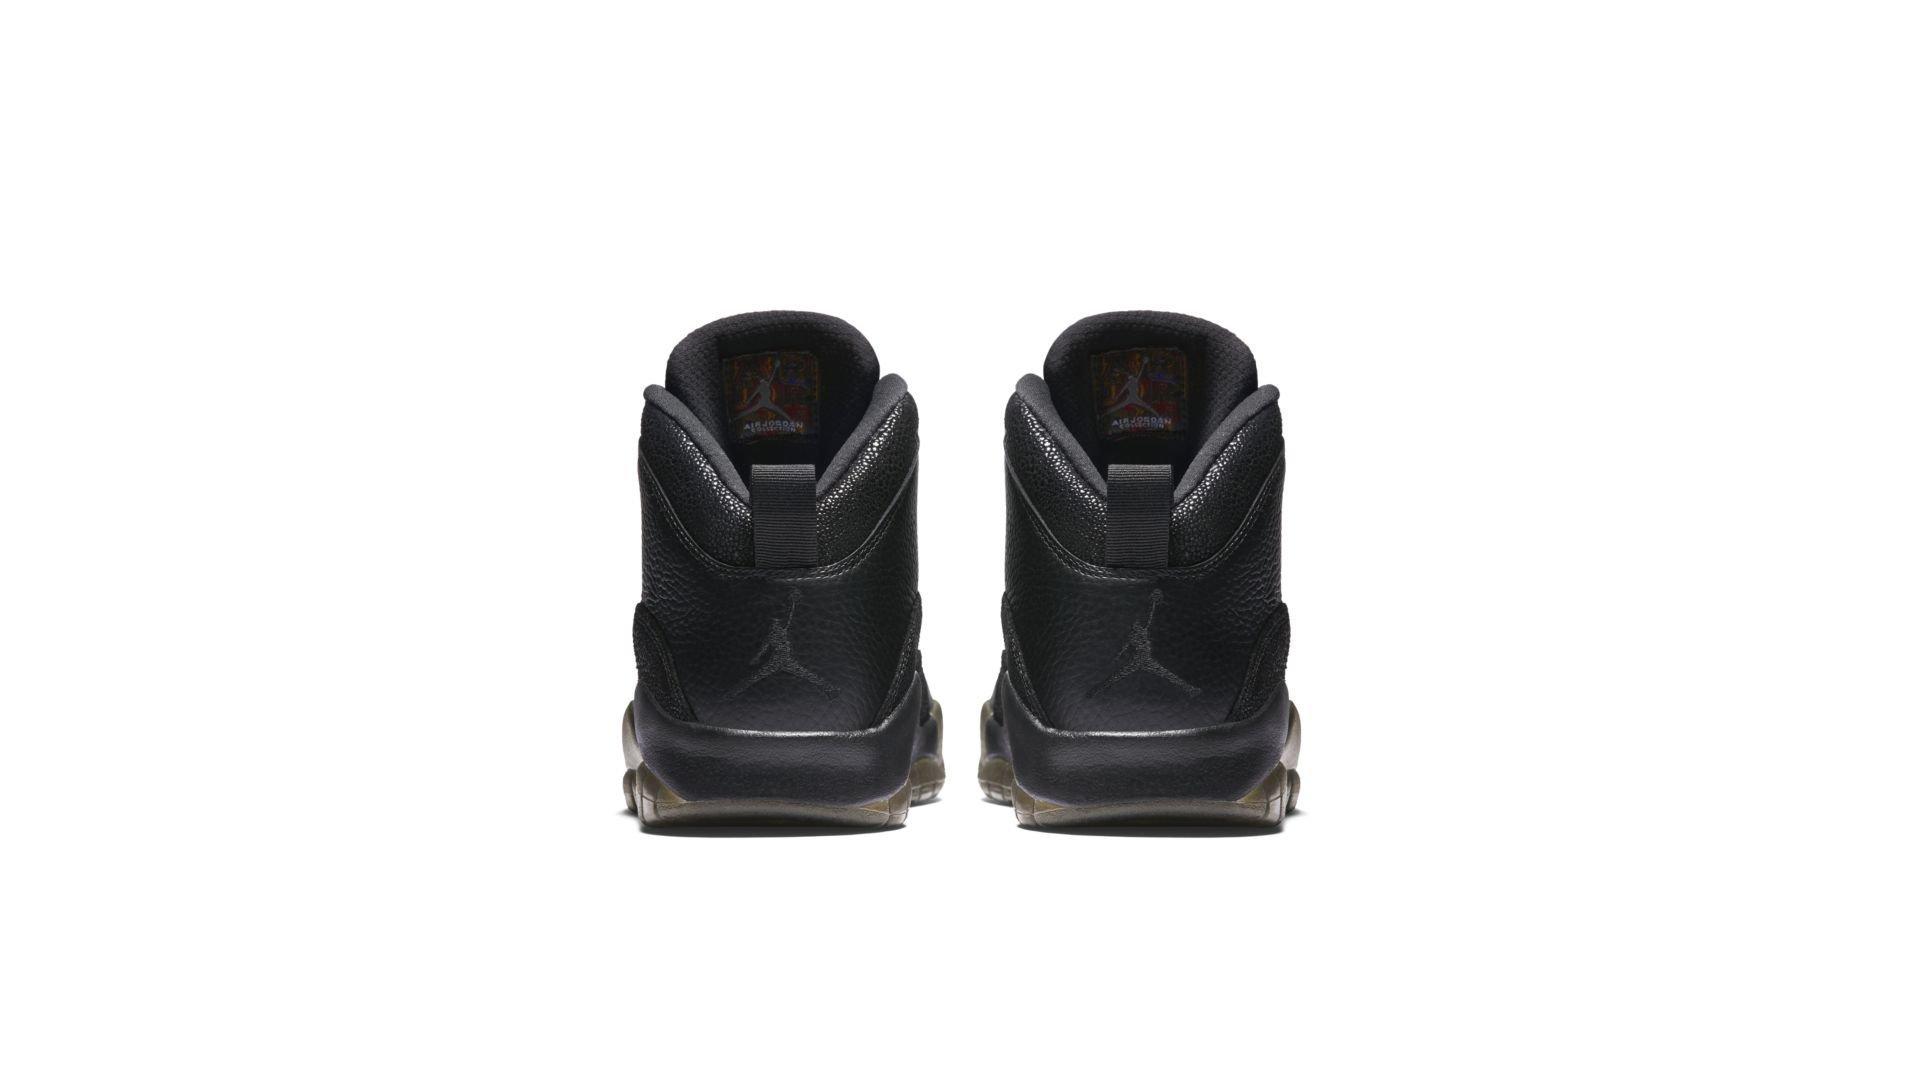 Jordan 10 Retro Drake OVO Black (819955-030)